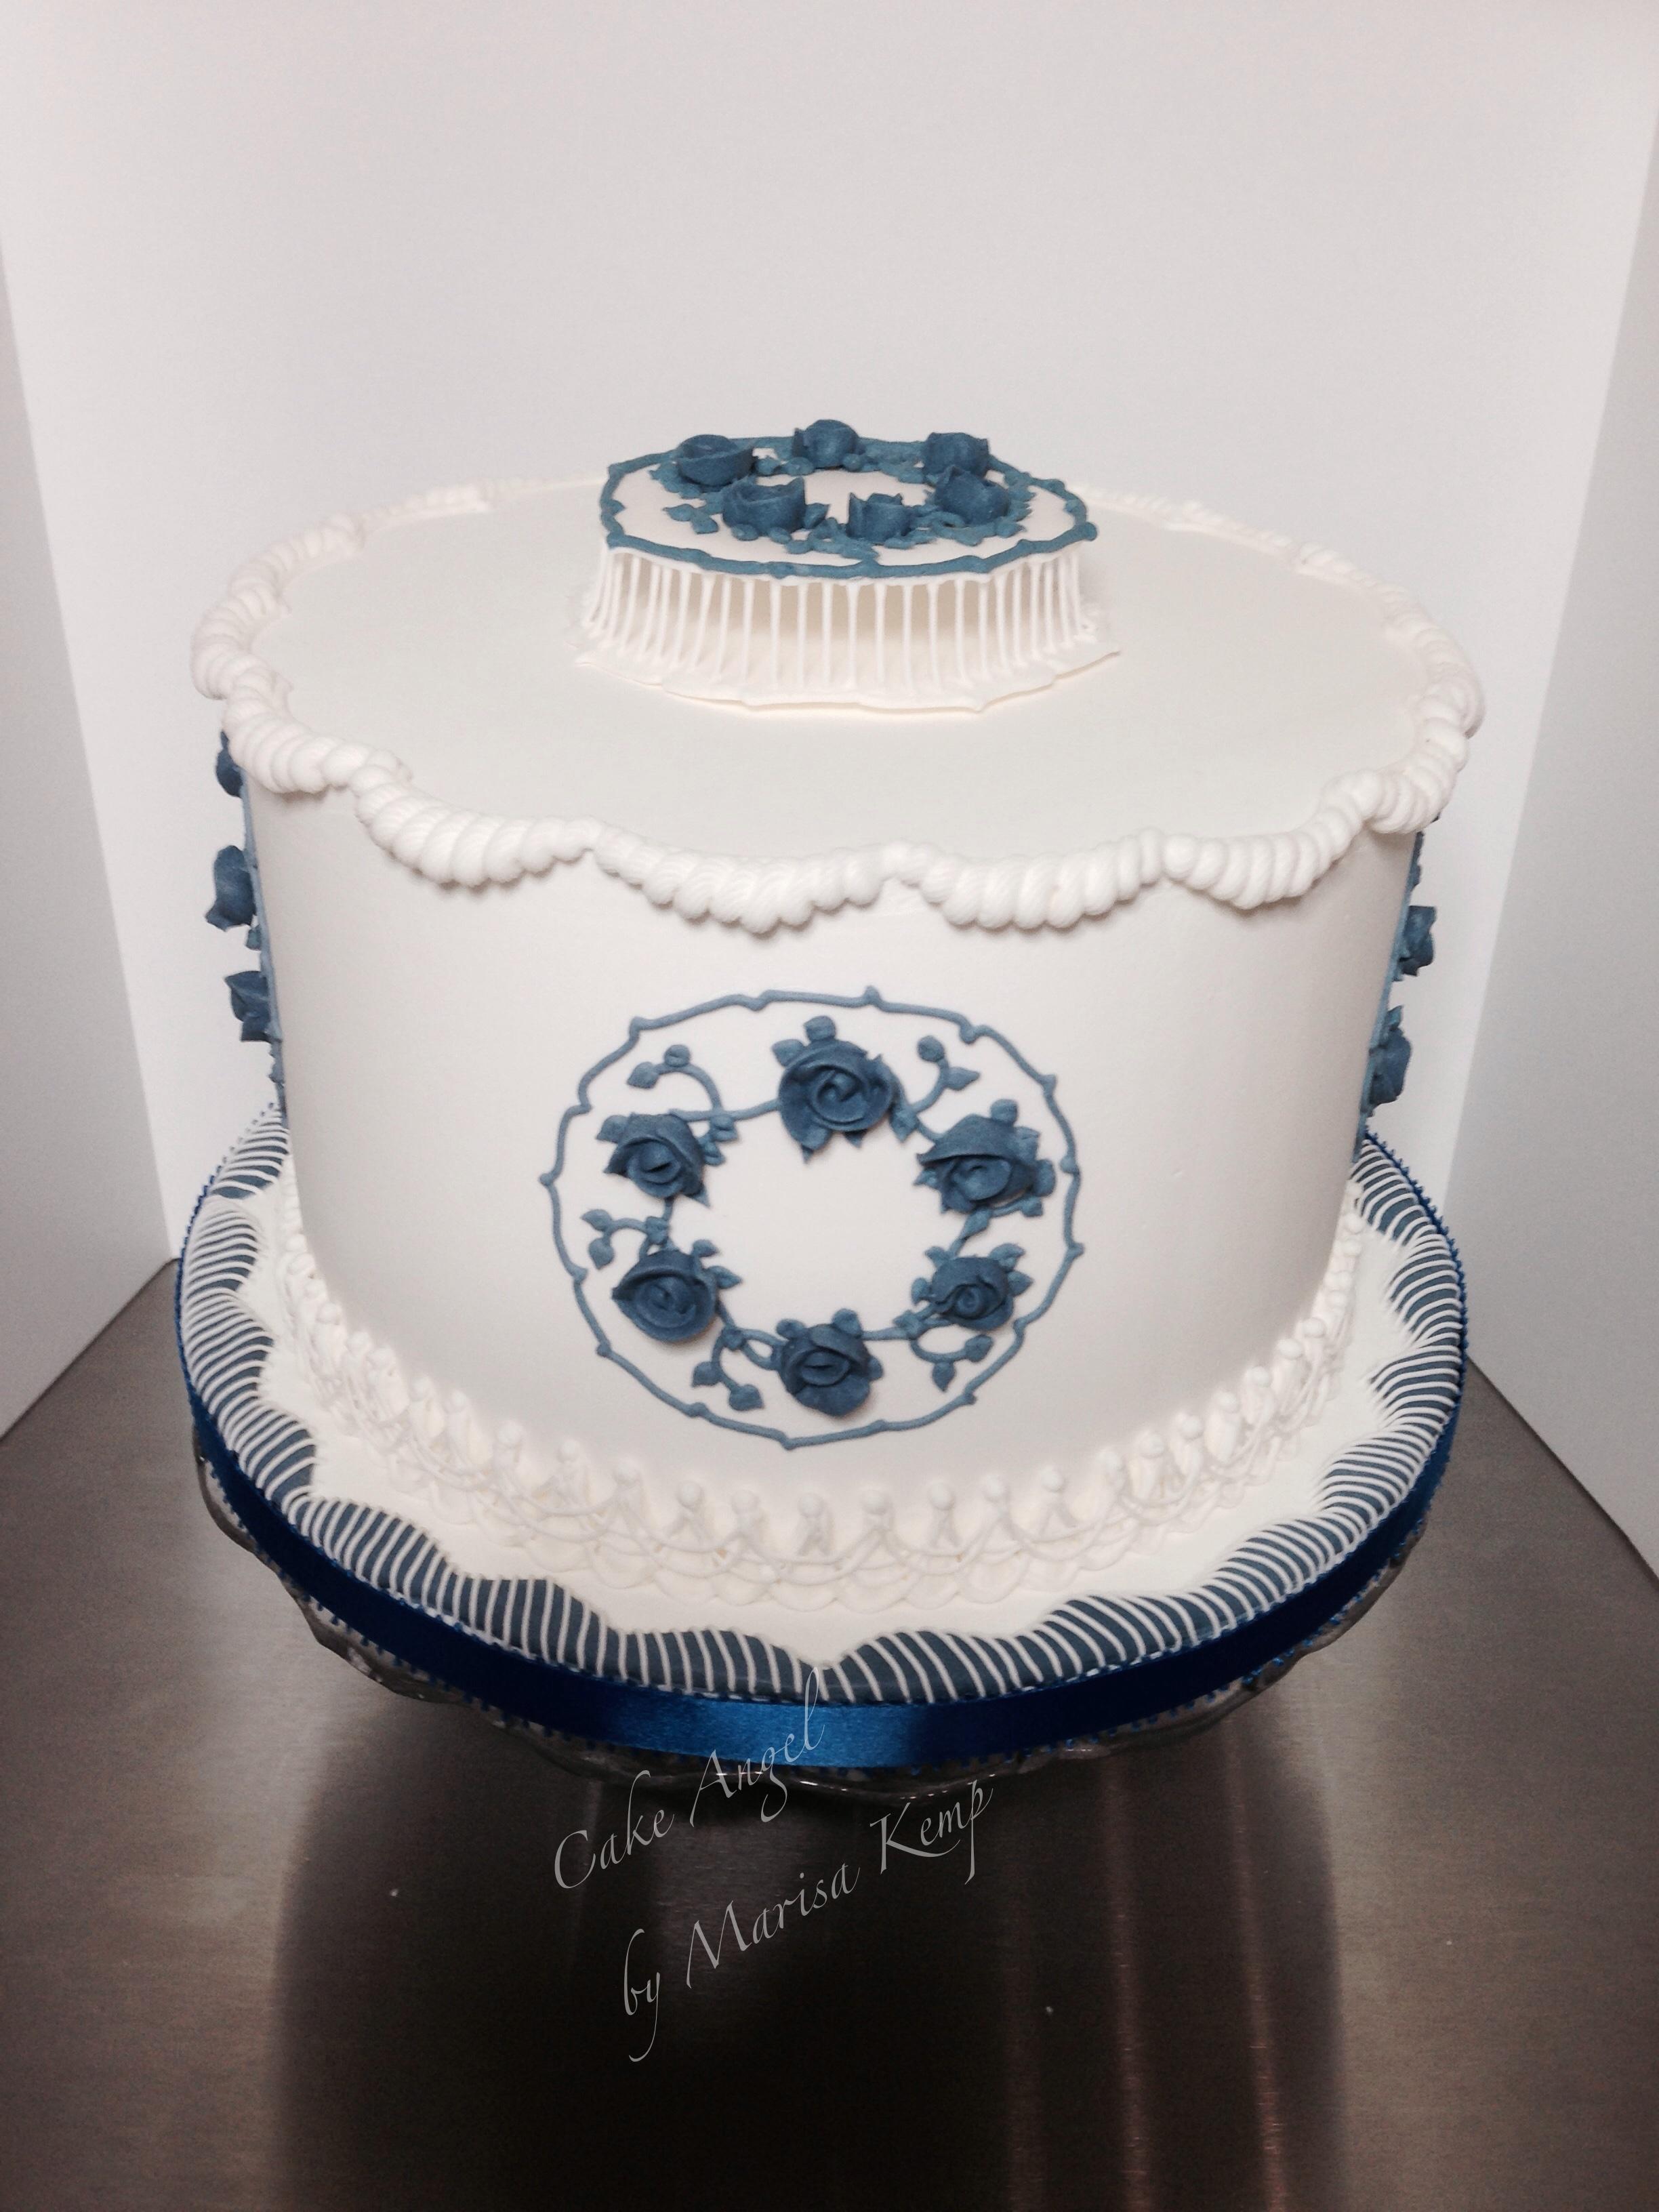 Royal iced inspired by porcelain design